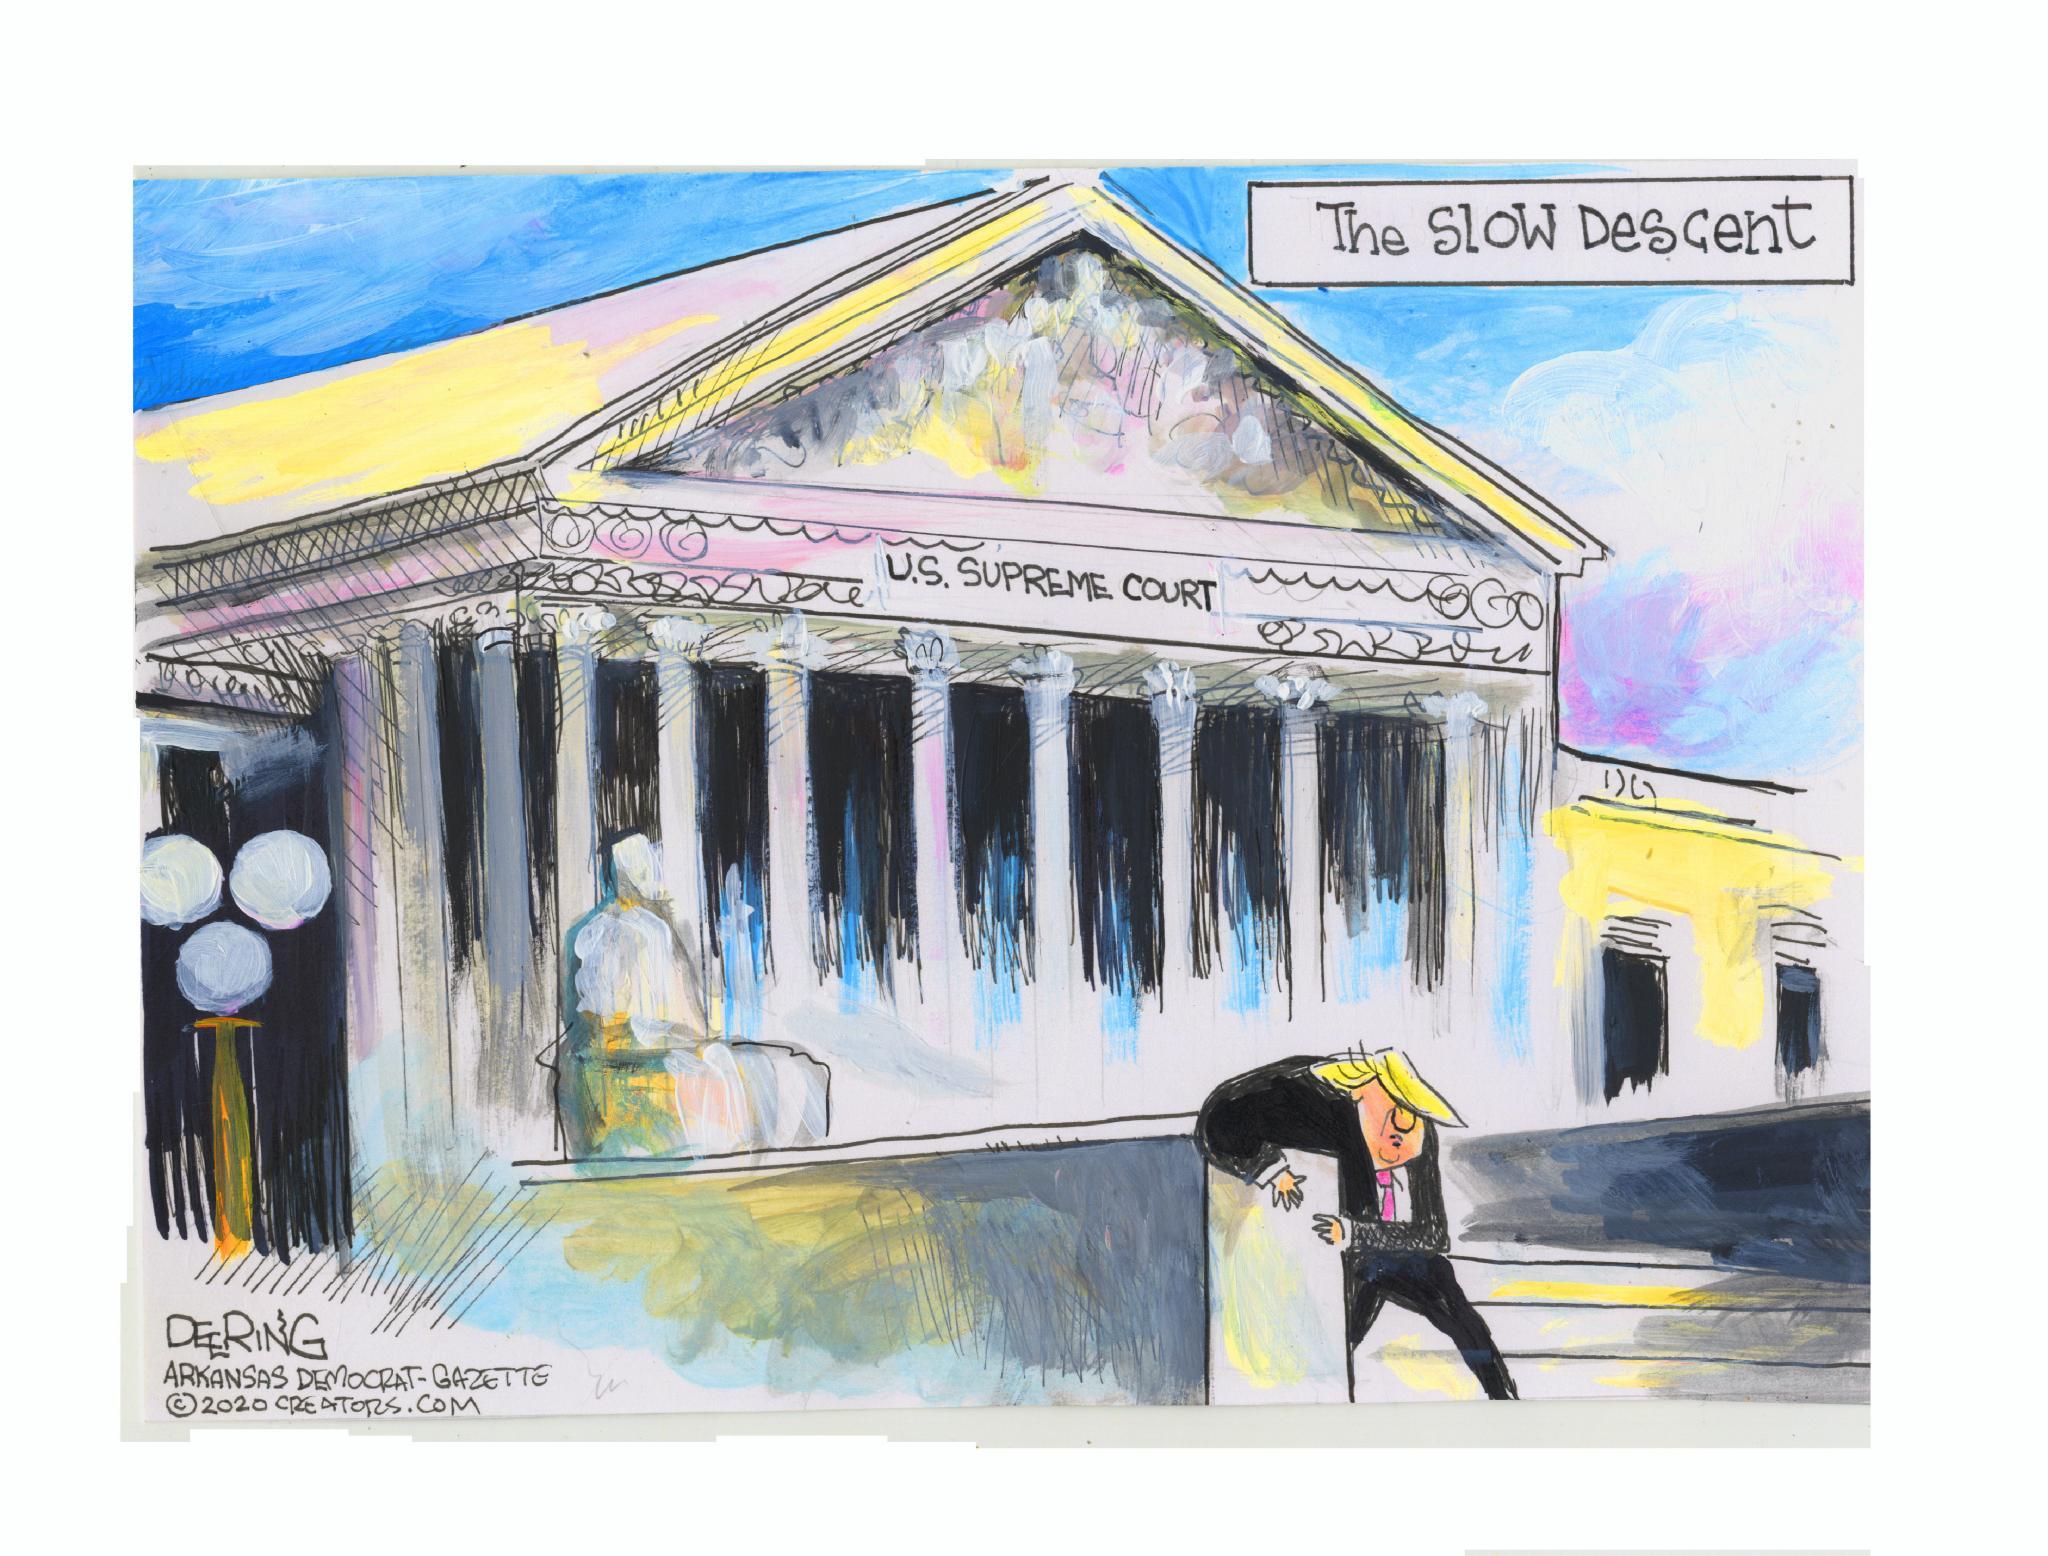 Political cartoons - the 'funny' pics thread.-jd071020dapr-jpg